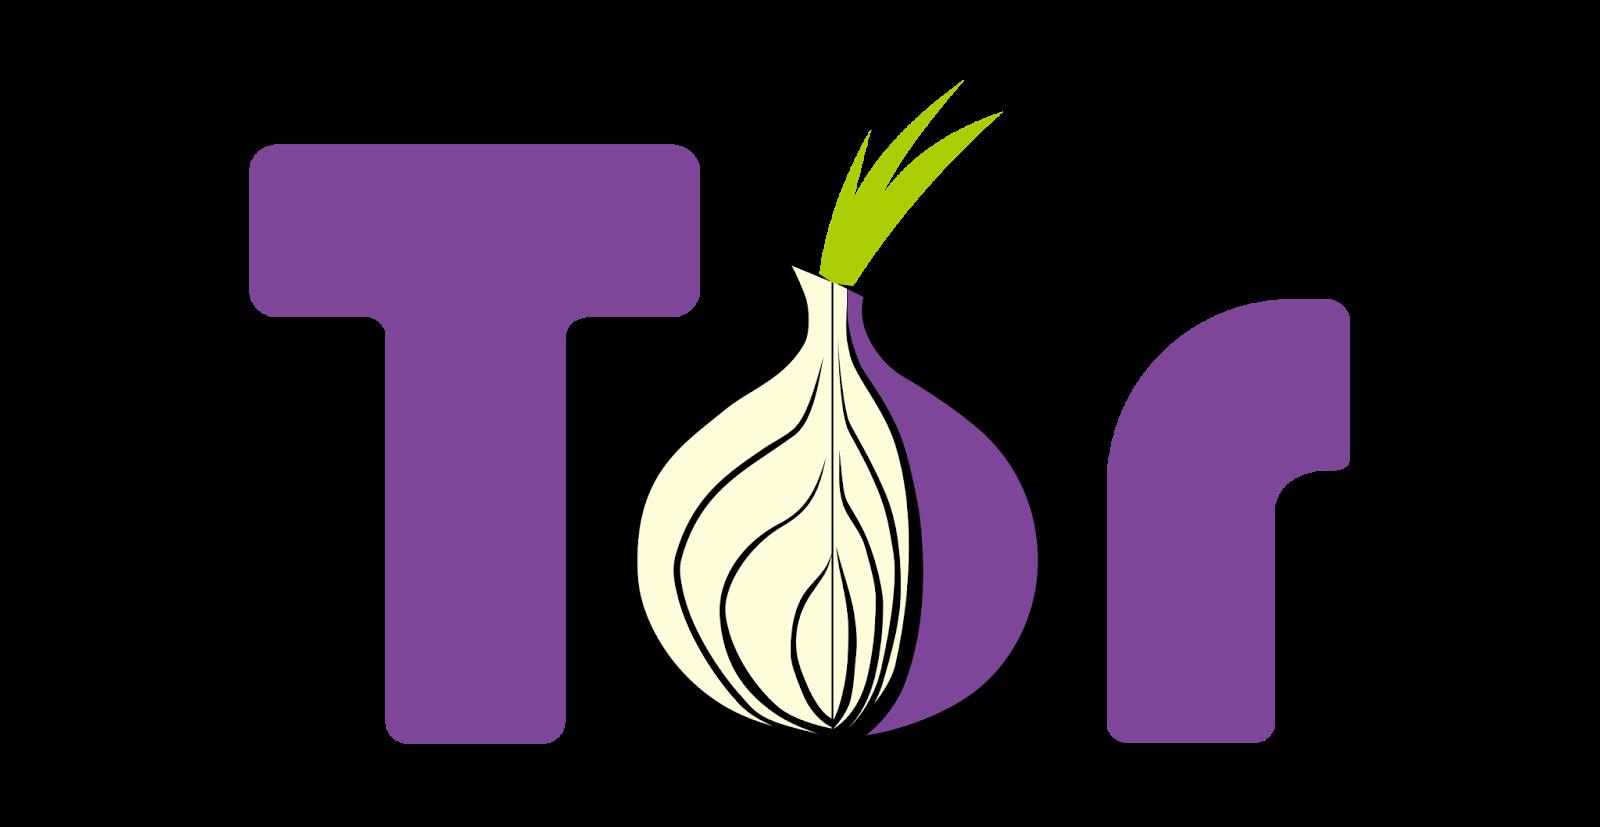 Тор браузер на айфон отзывы hidra javascript tor browser android gydra